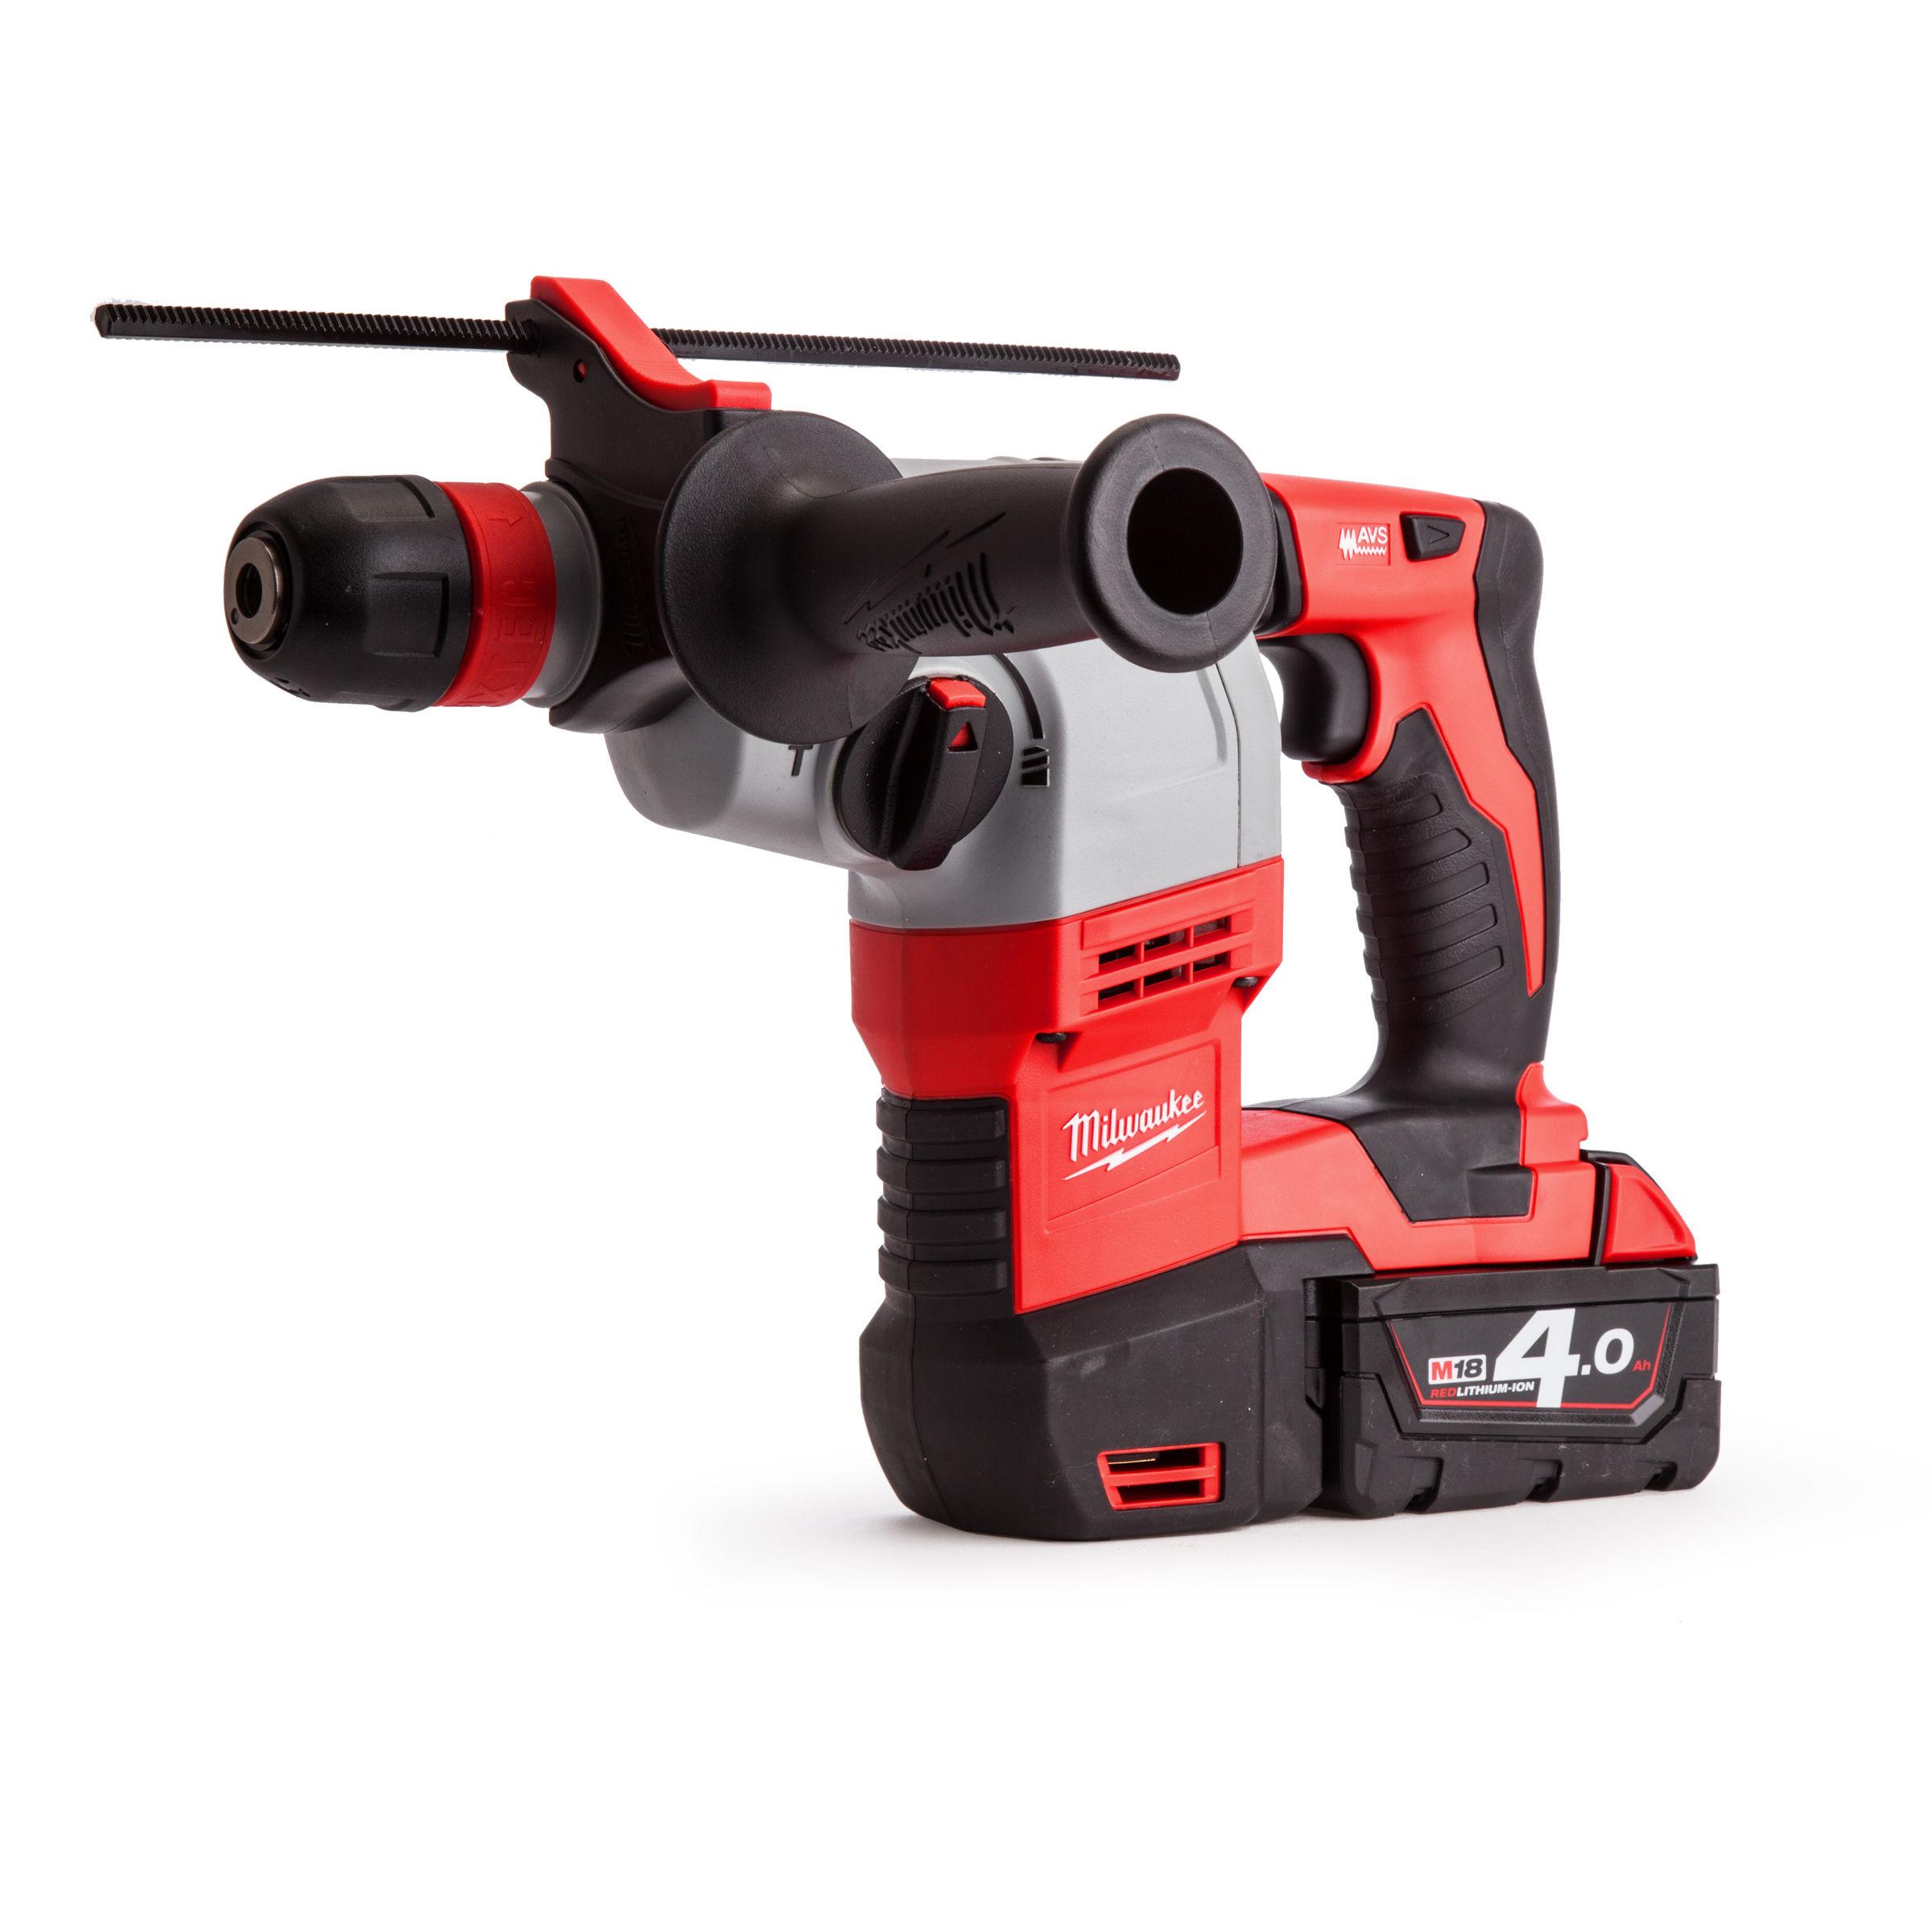 Milwaukee HD18HX-402C 18v Rotary Hammer Drill (2x4 0ah batteries)